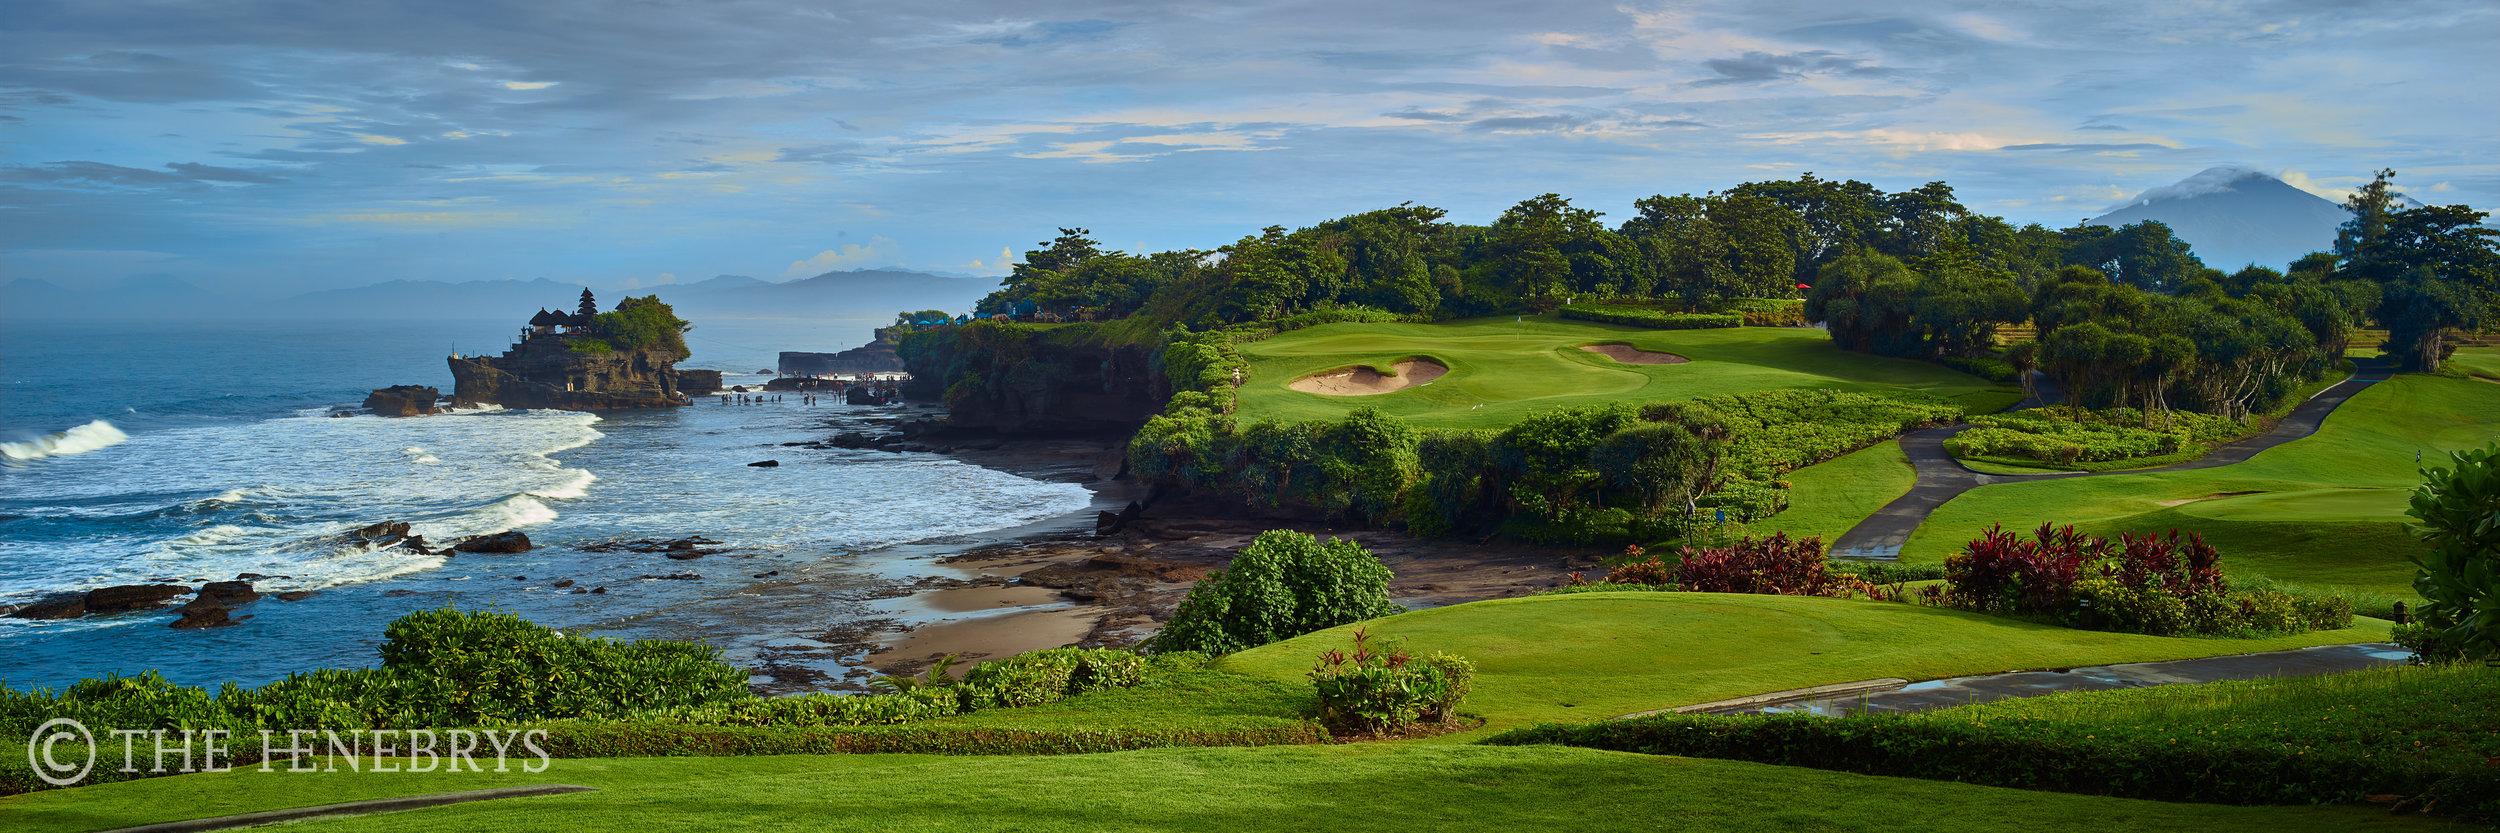 Nirwana Bali Golf Club #07, Indonesia